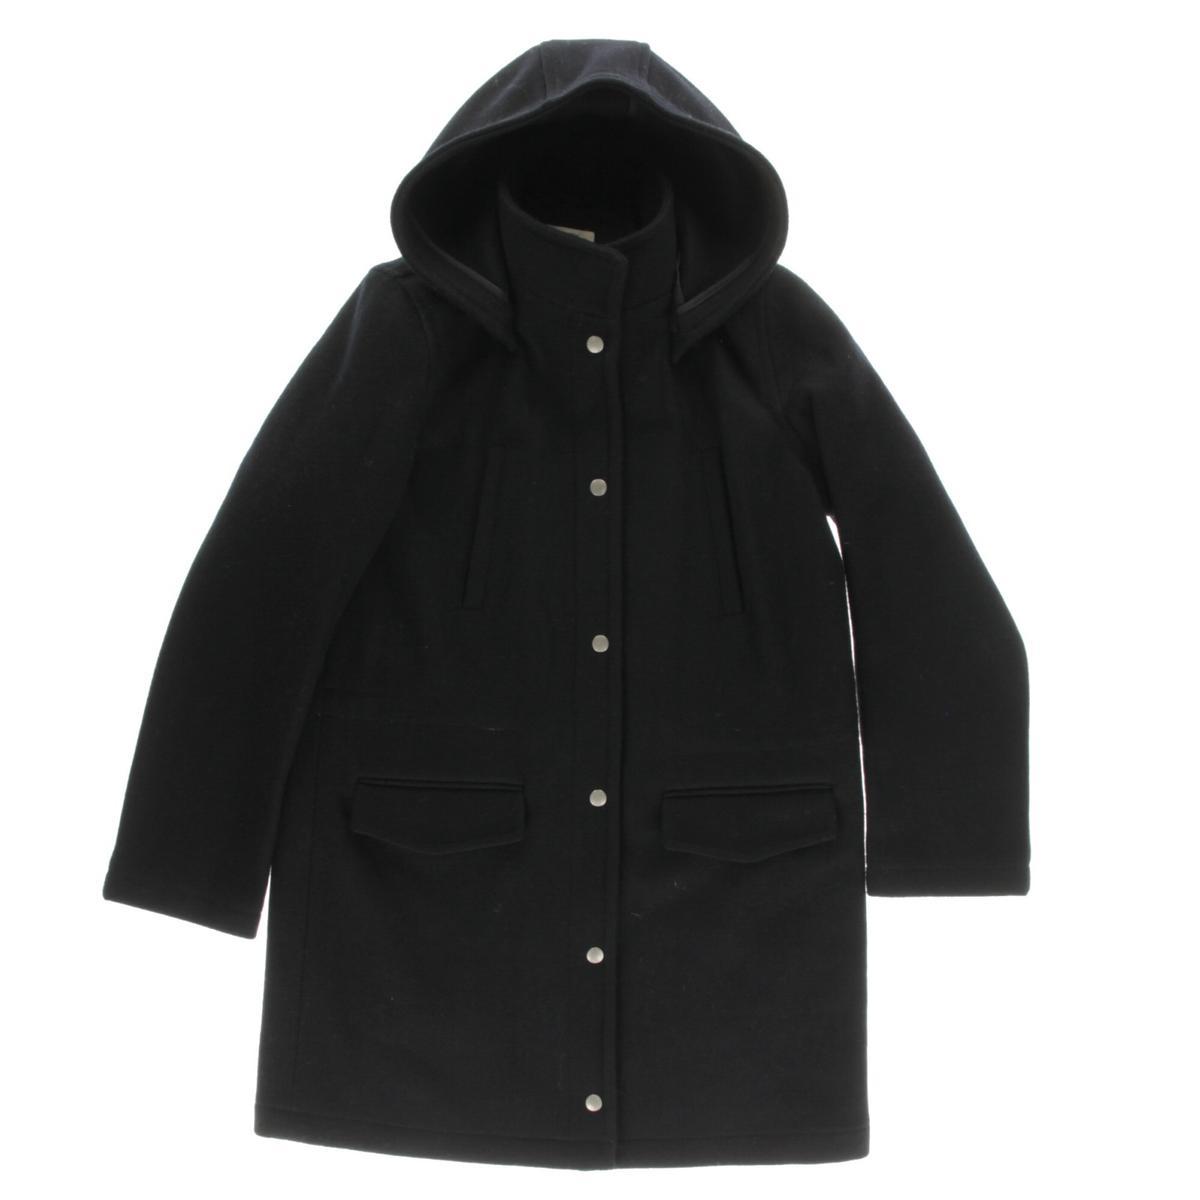 Sperry Top-Sider Womens Wool Hooded Pea Coat